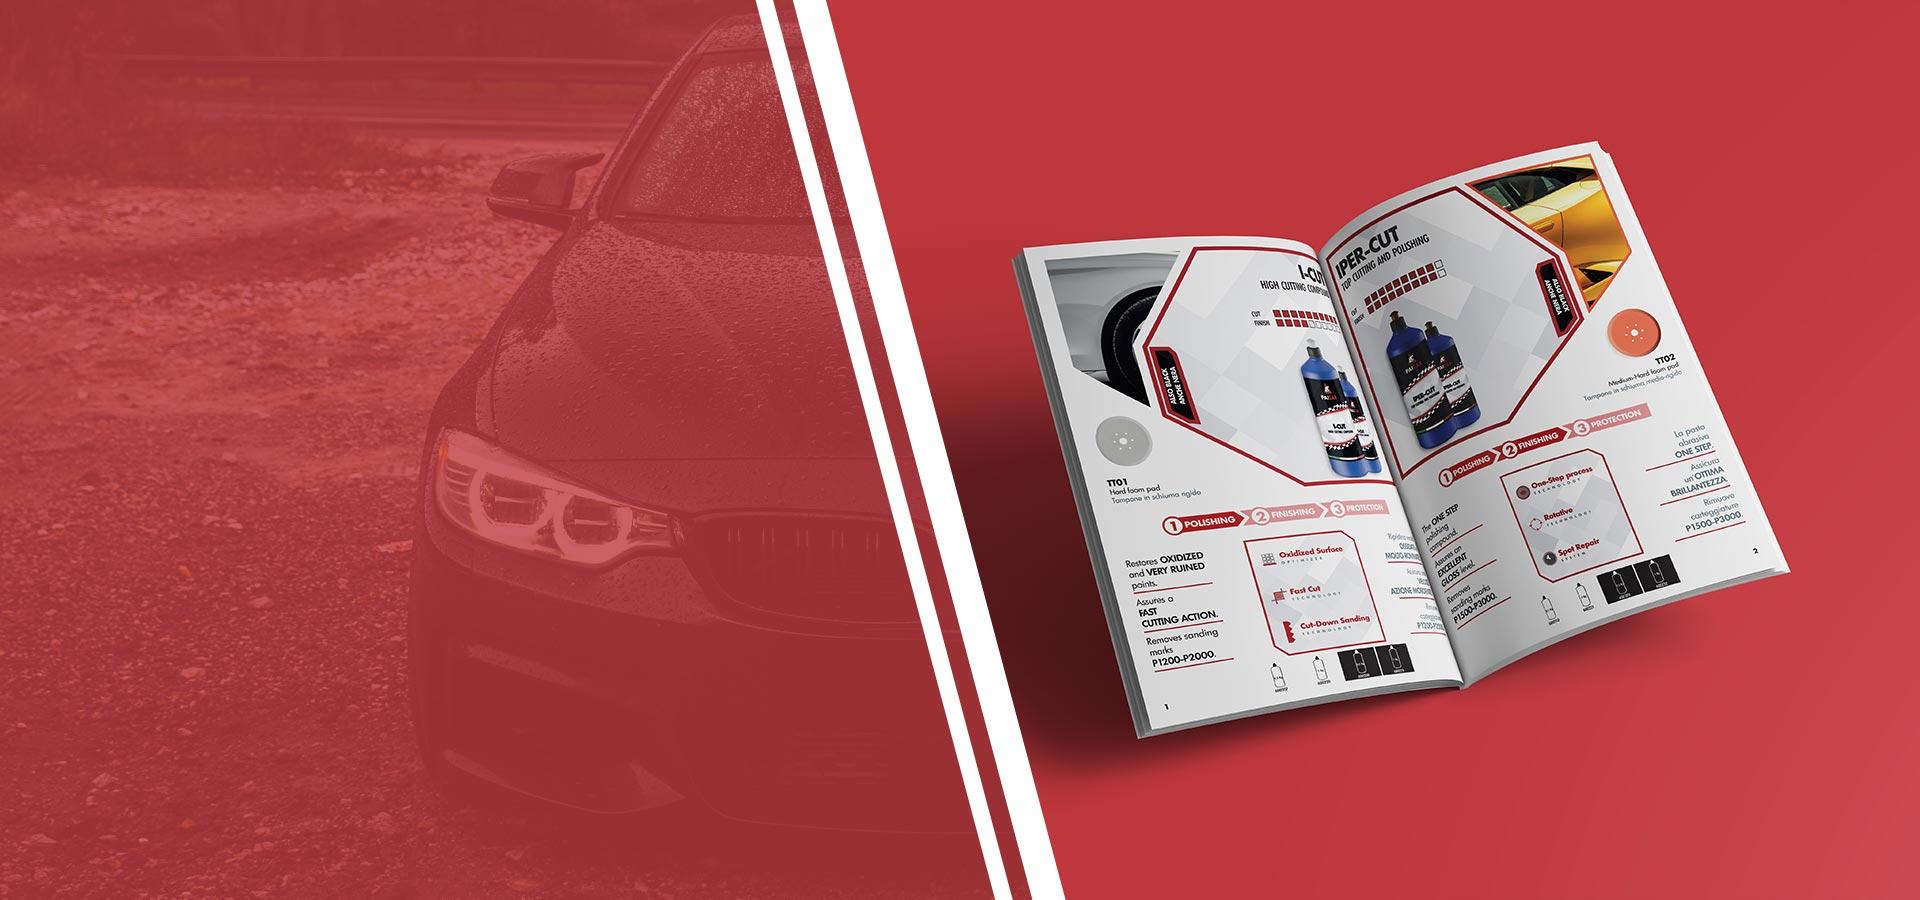 catalogo_prodotti_lucidatura_auto_detailing_auto_pai_car_pai_cristal_italia_2